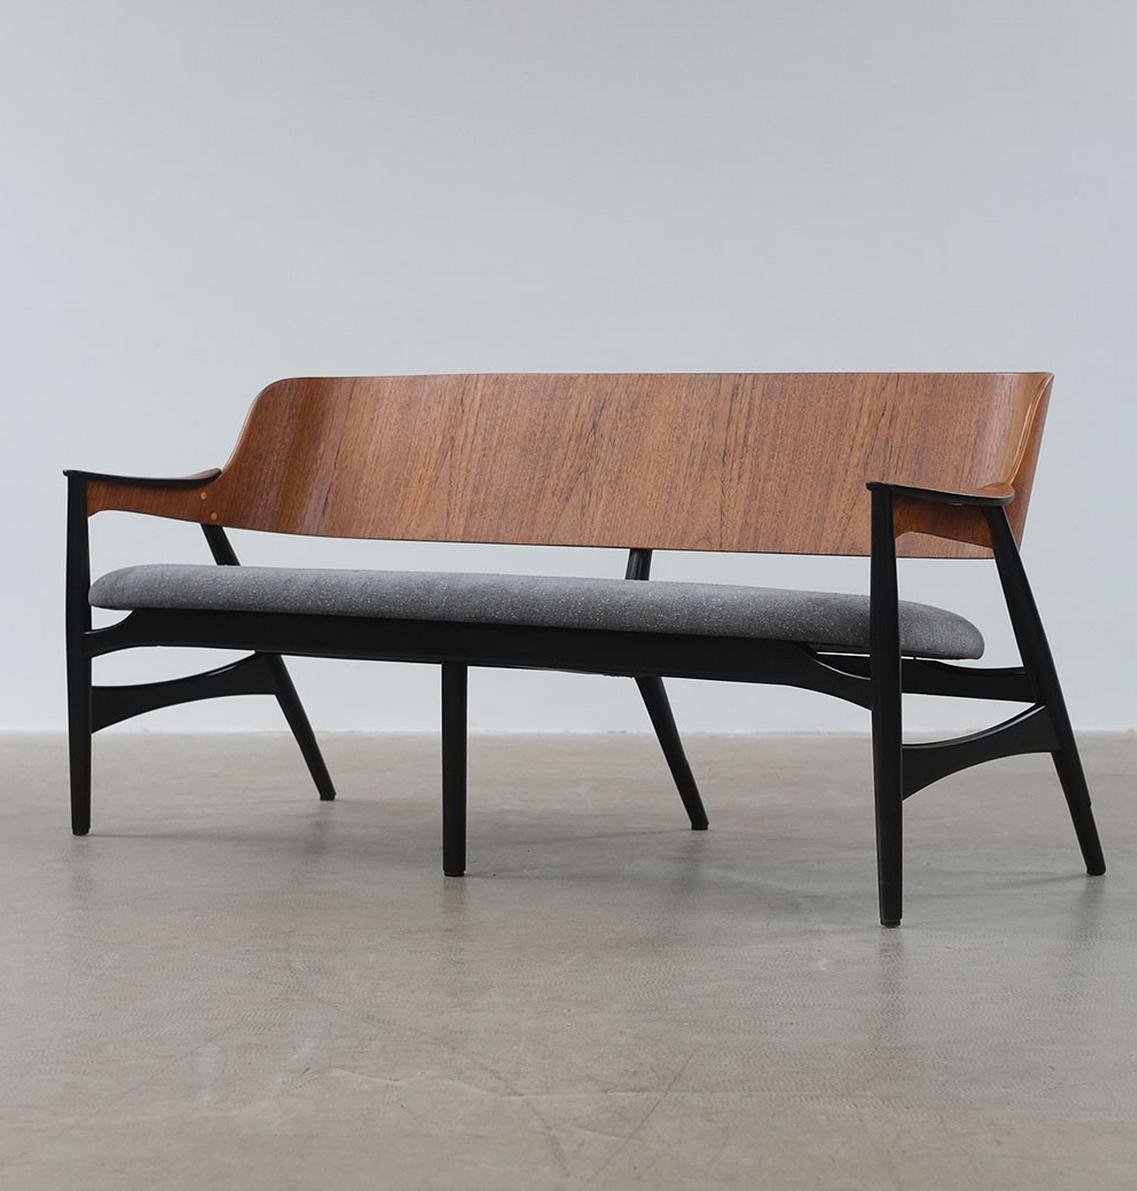 Ebonized Wood Furniture ~ Interior design decoration home decor furniture